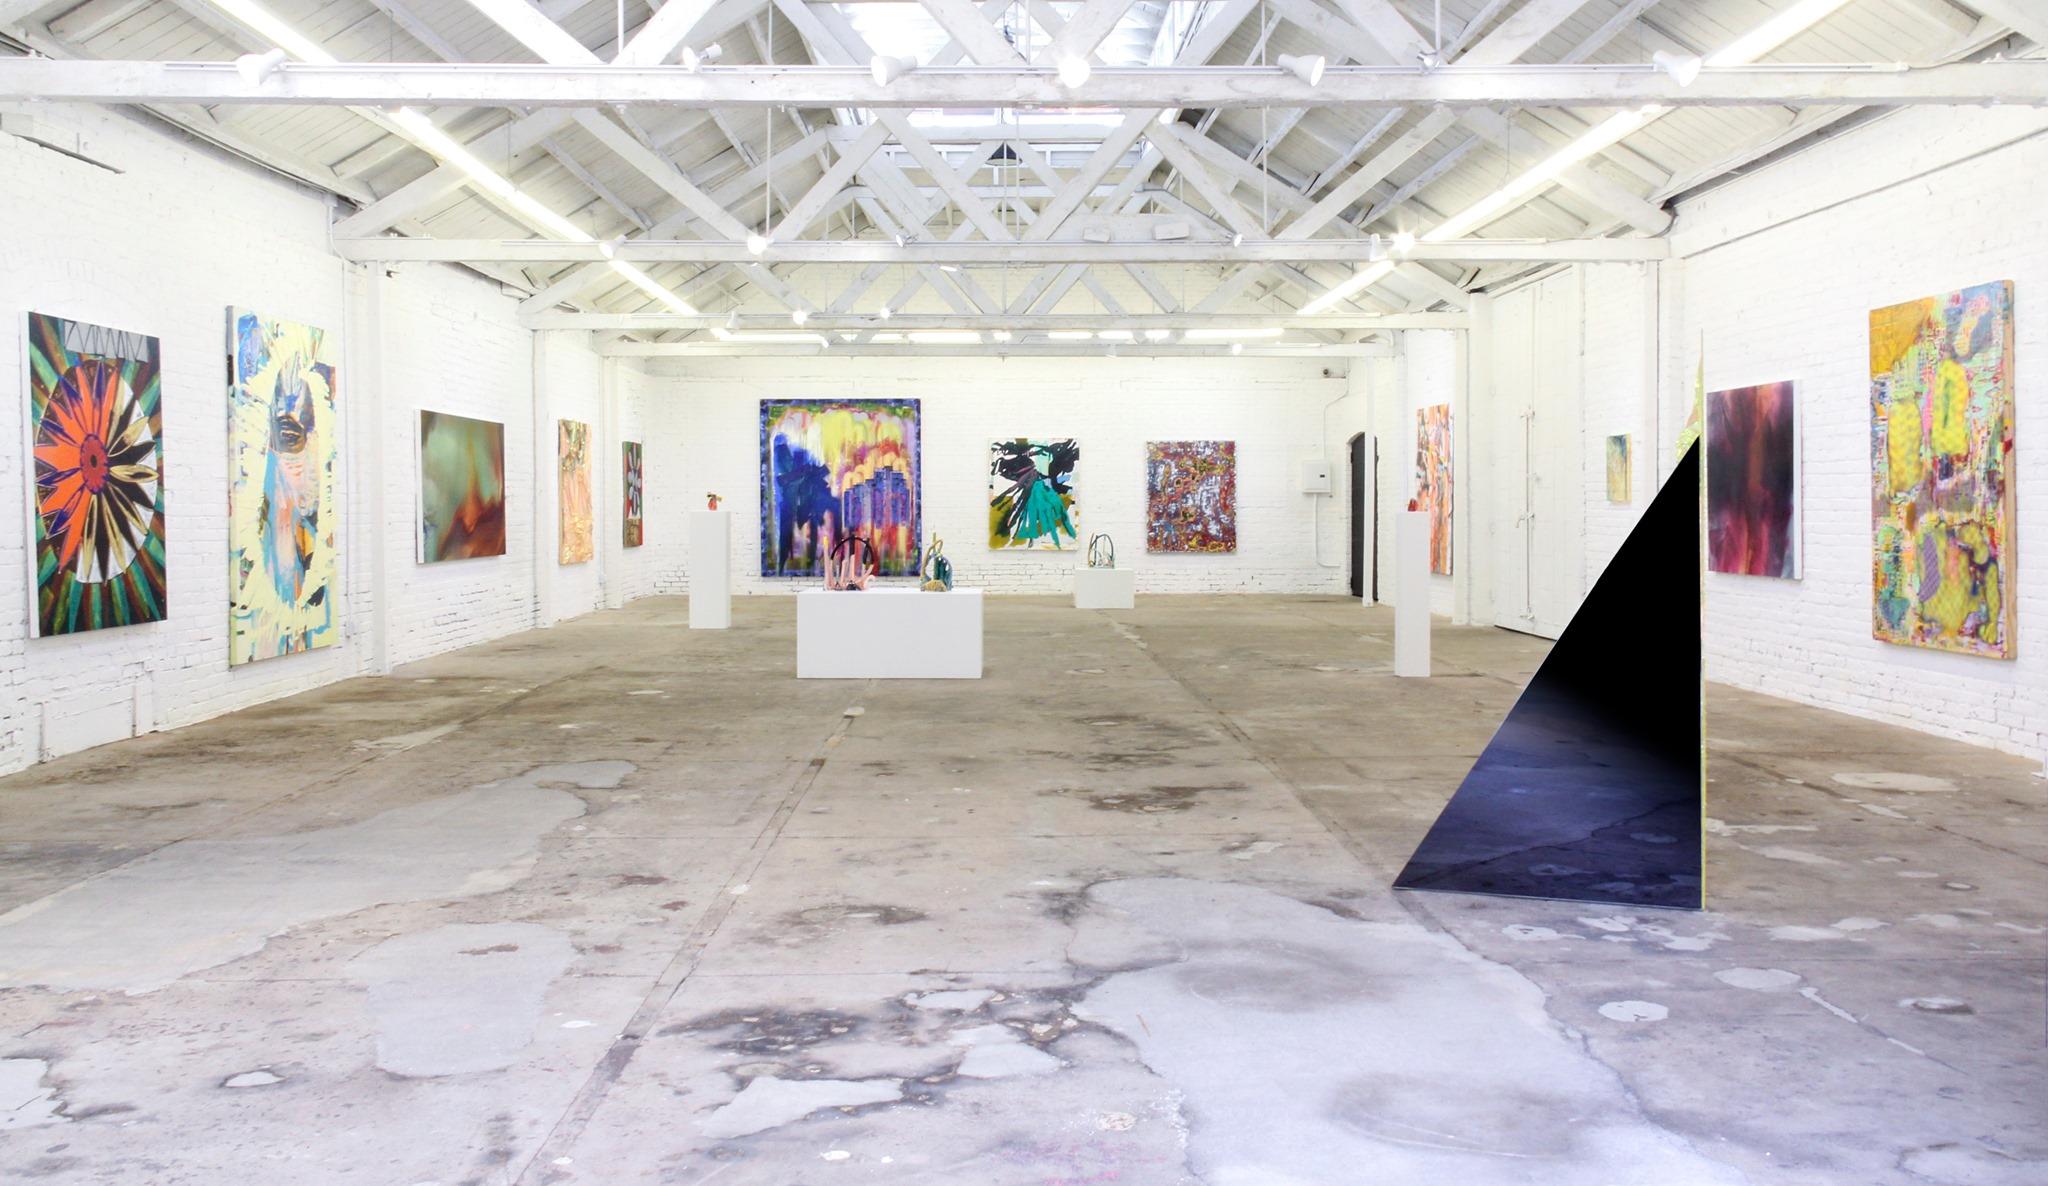 (Beyond) Redemption, art exhibit @ Backspace Gallery // photo source: launchla.org